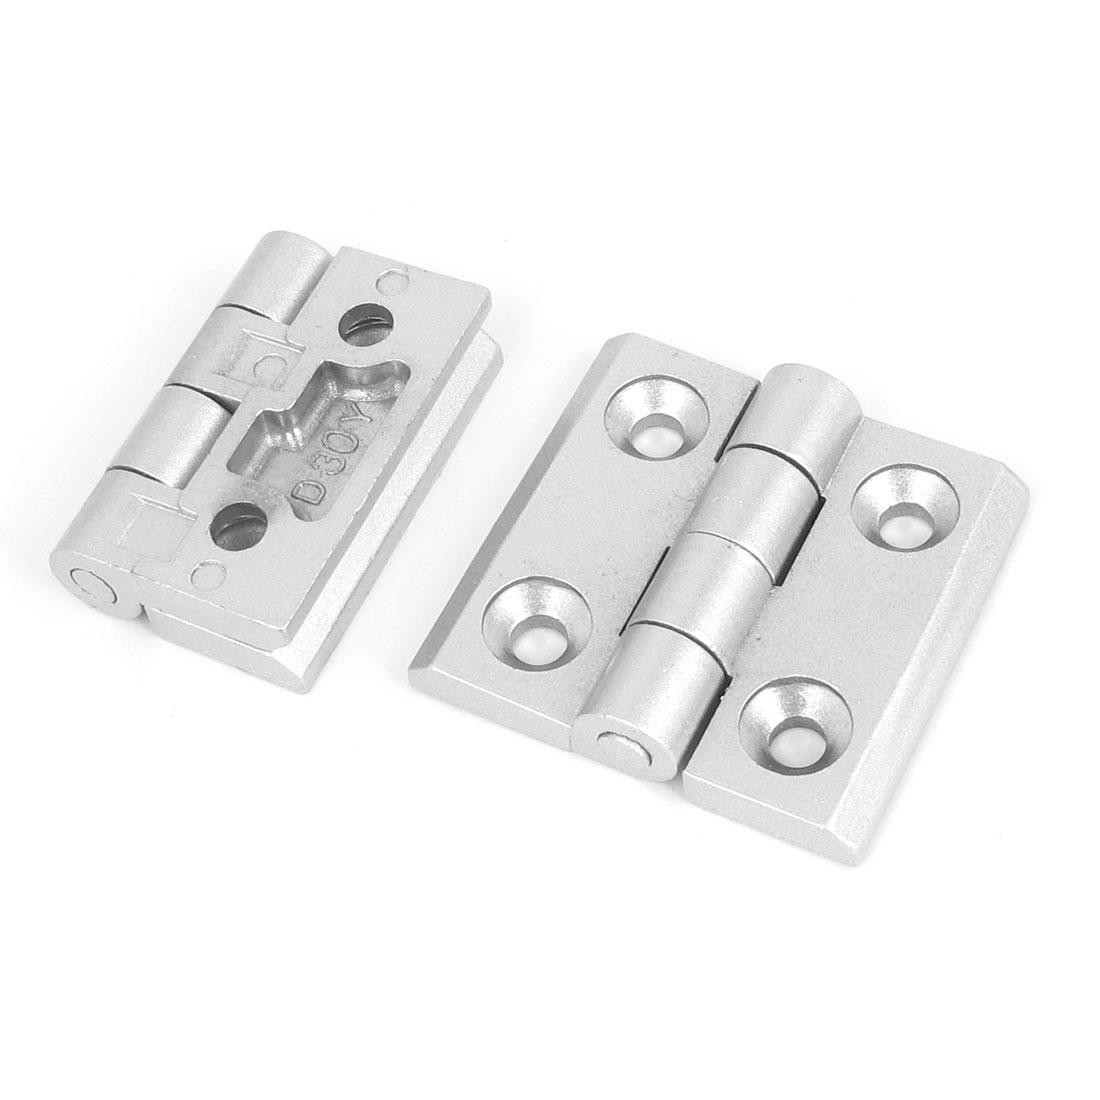 2pcs Cupboard Cabinet Closet Alloy Door Butt Hinge 55mm Long Silver Tone